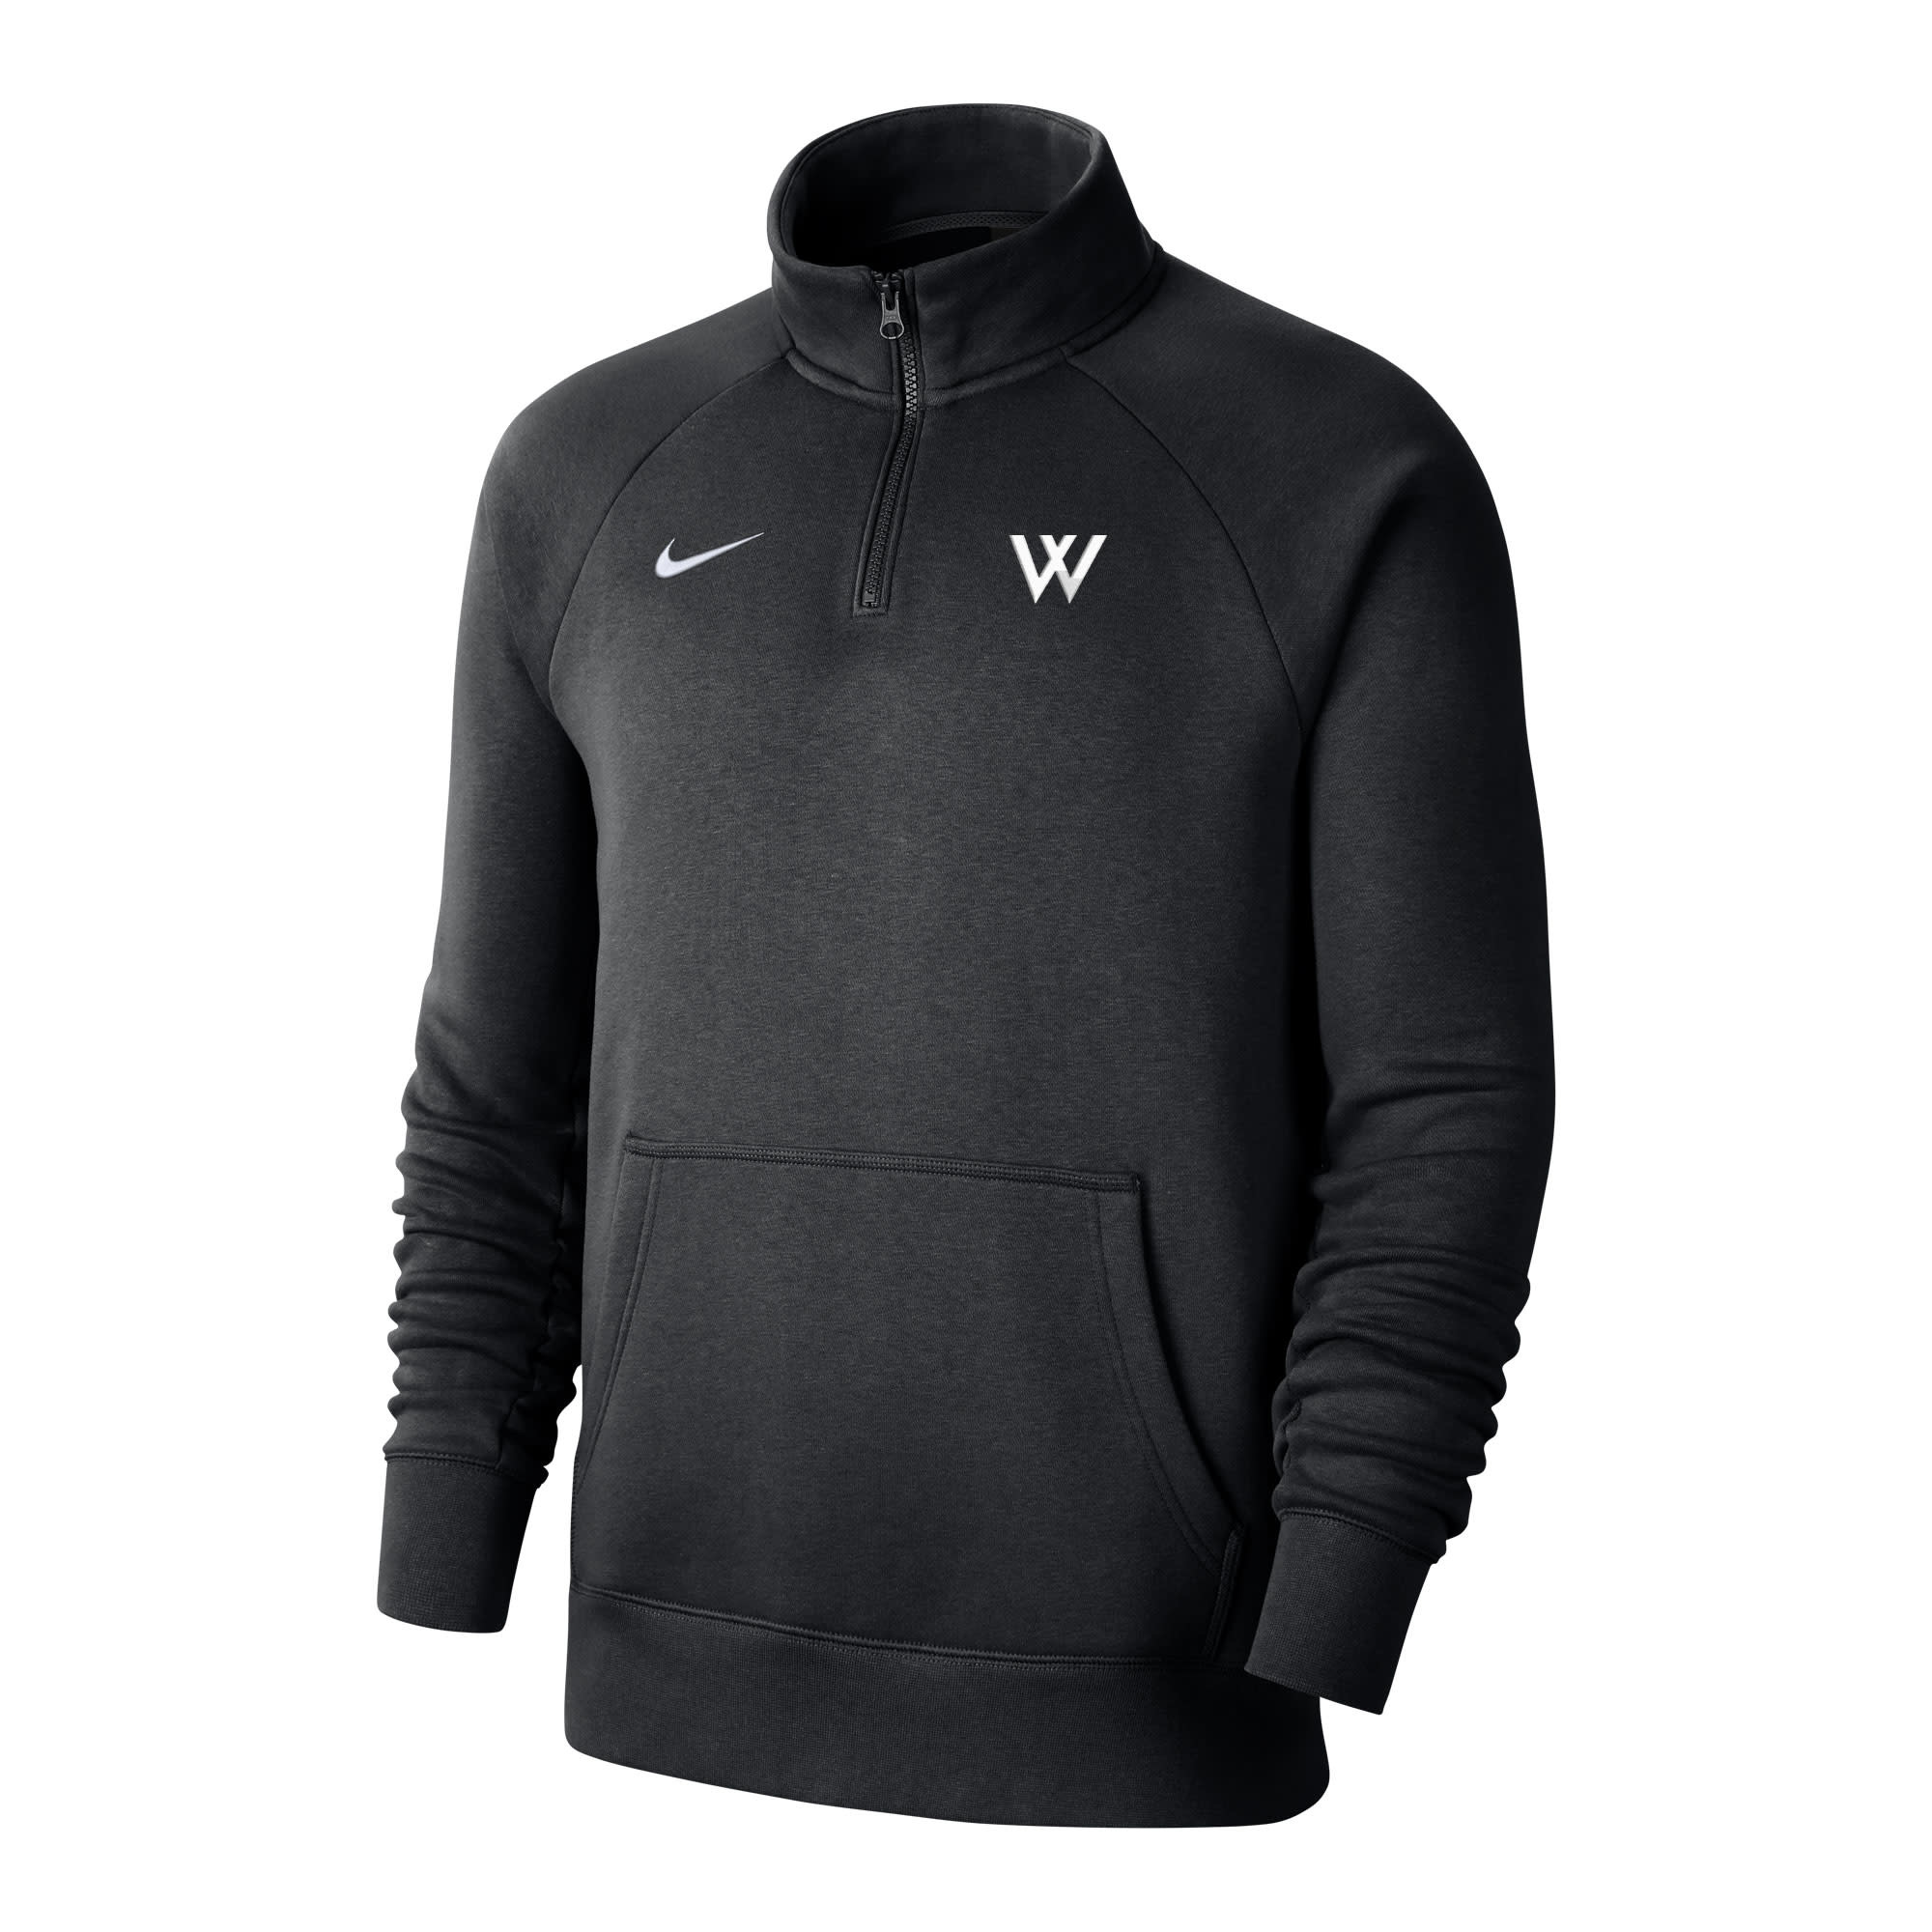 Nike Pullover: Nike Club Fleece 1/4 Zip w/W